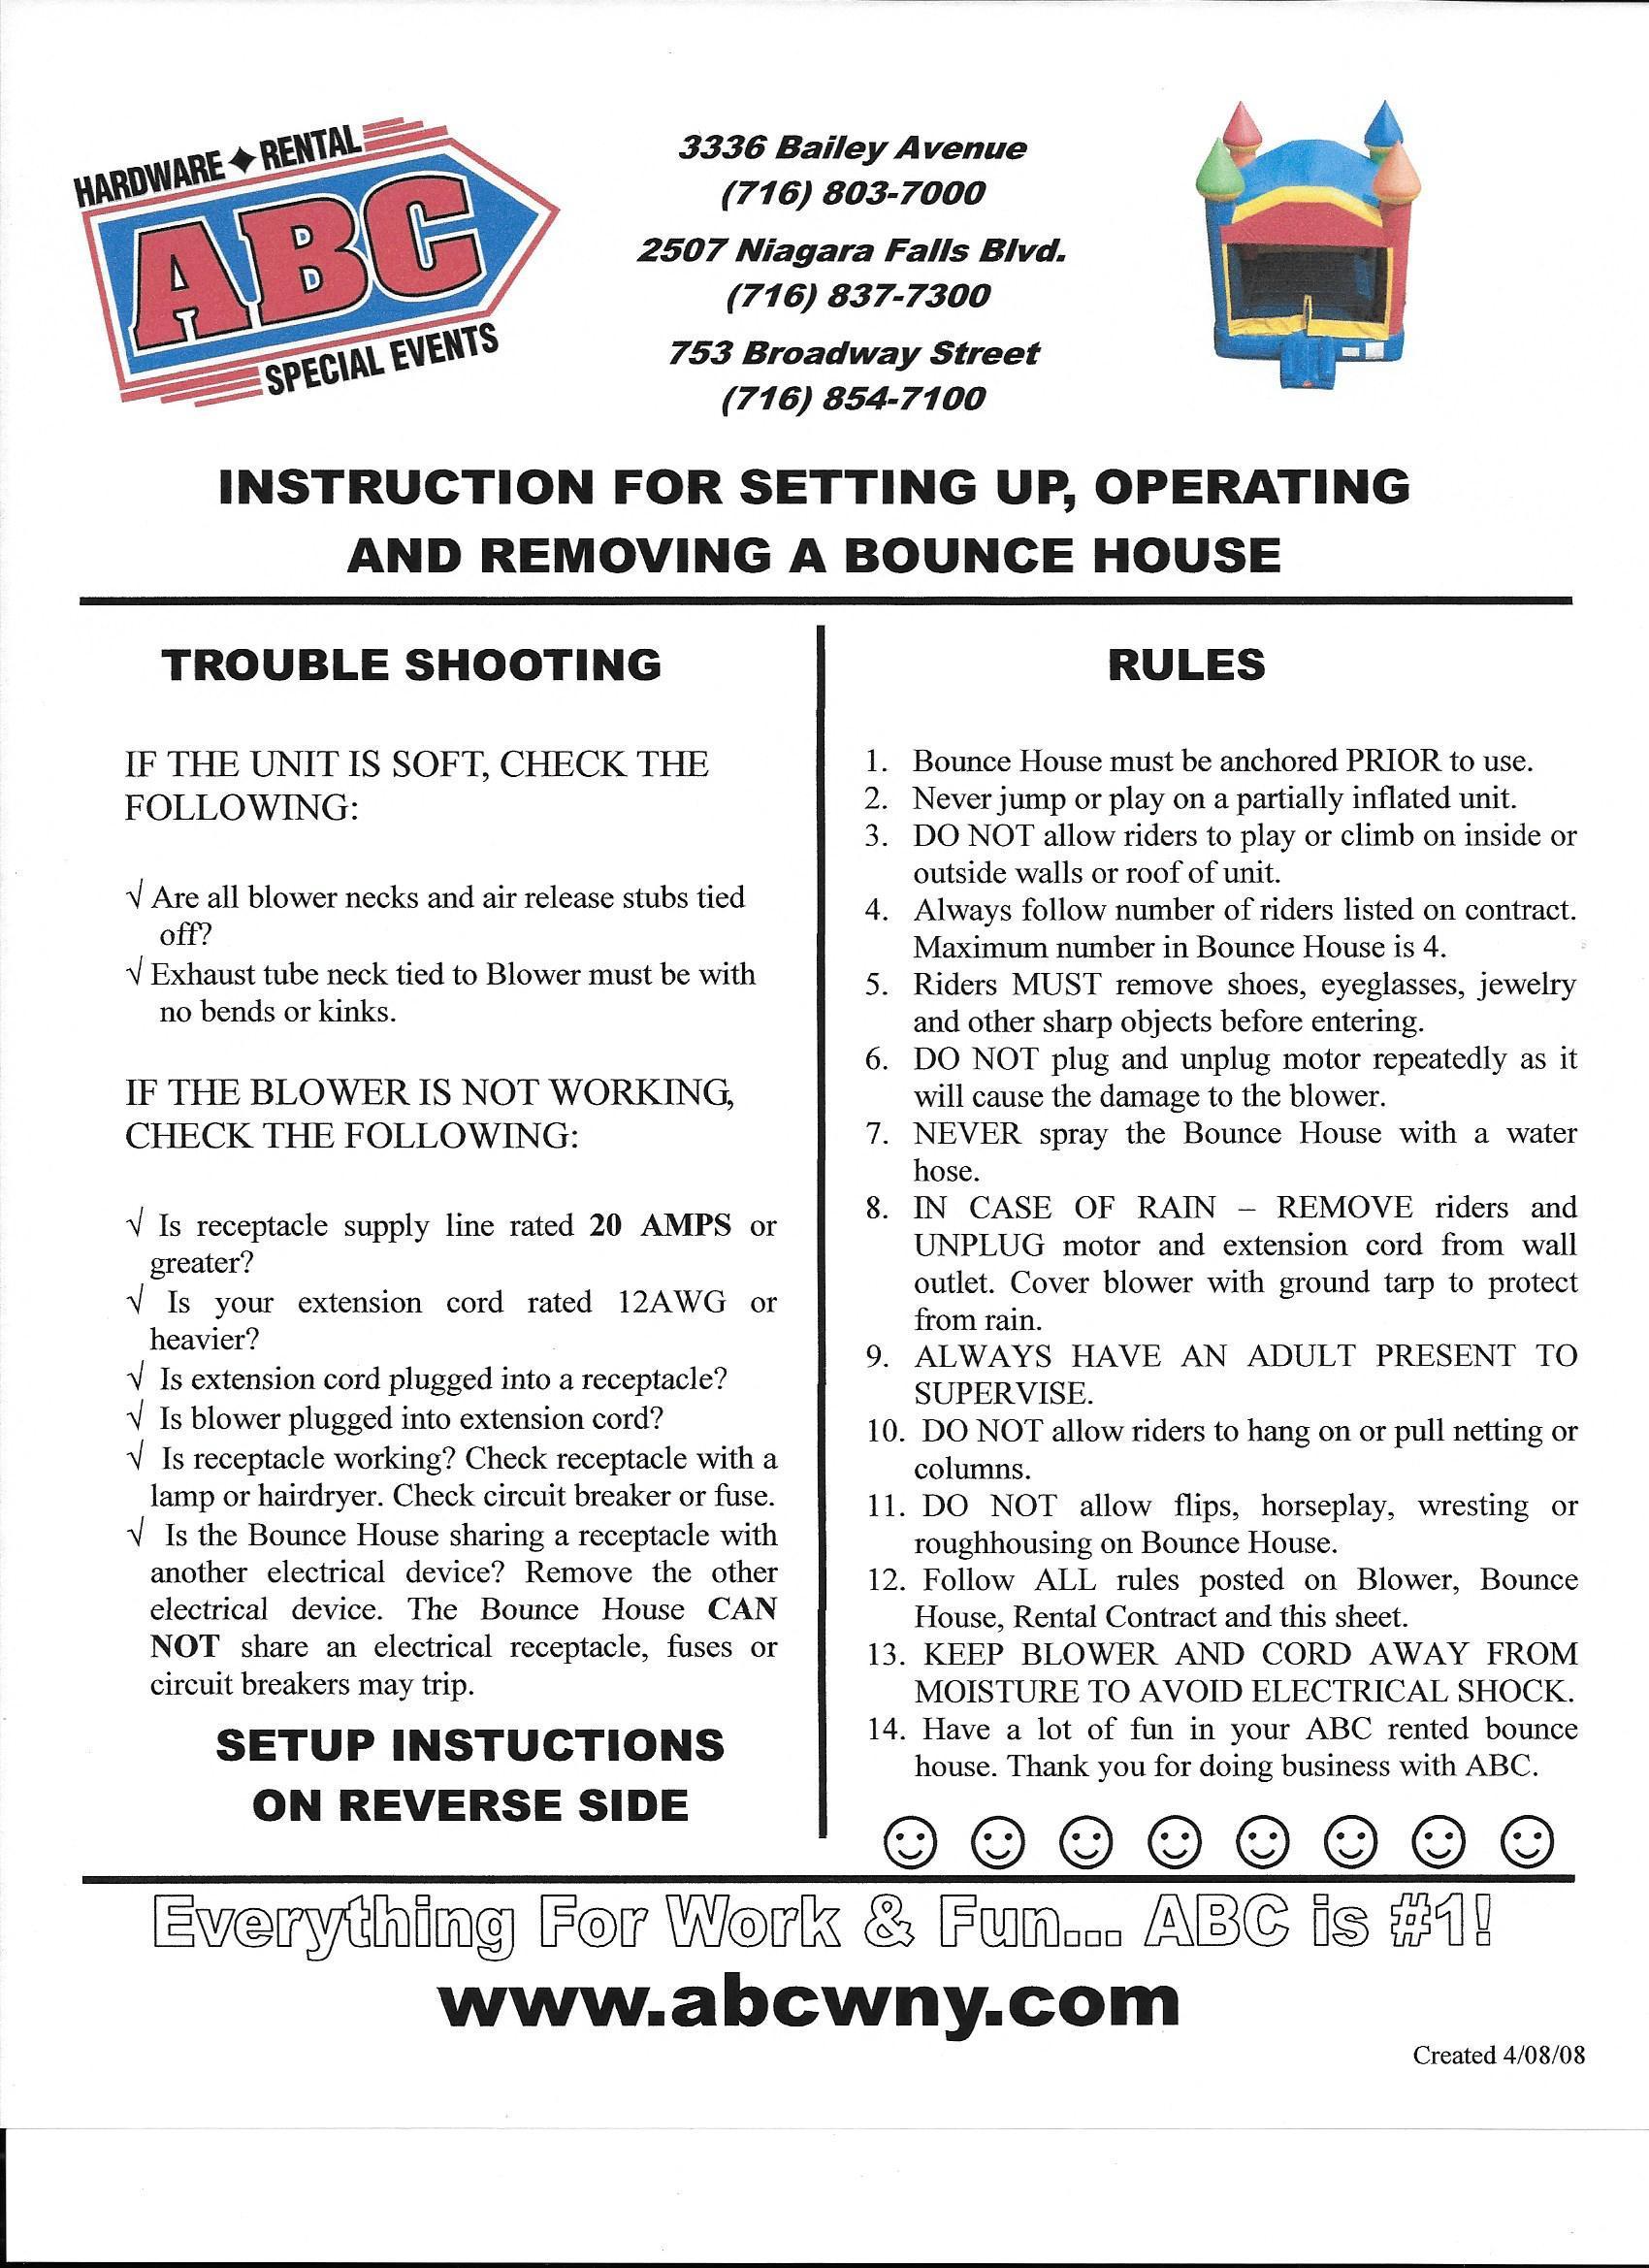 bounce-house-instructions0002.jpg